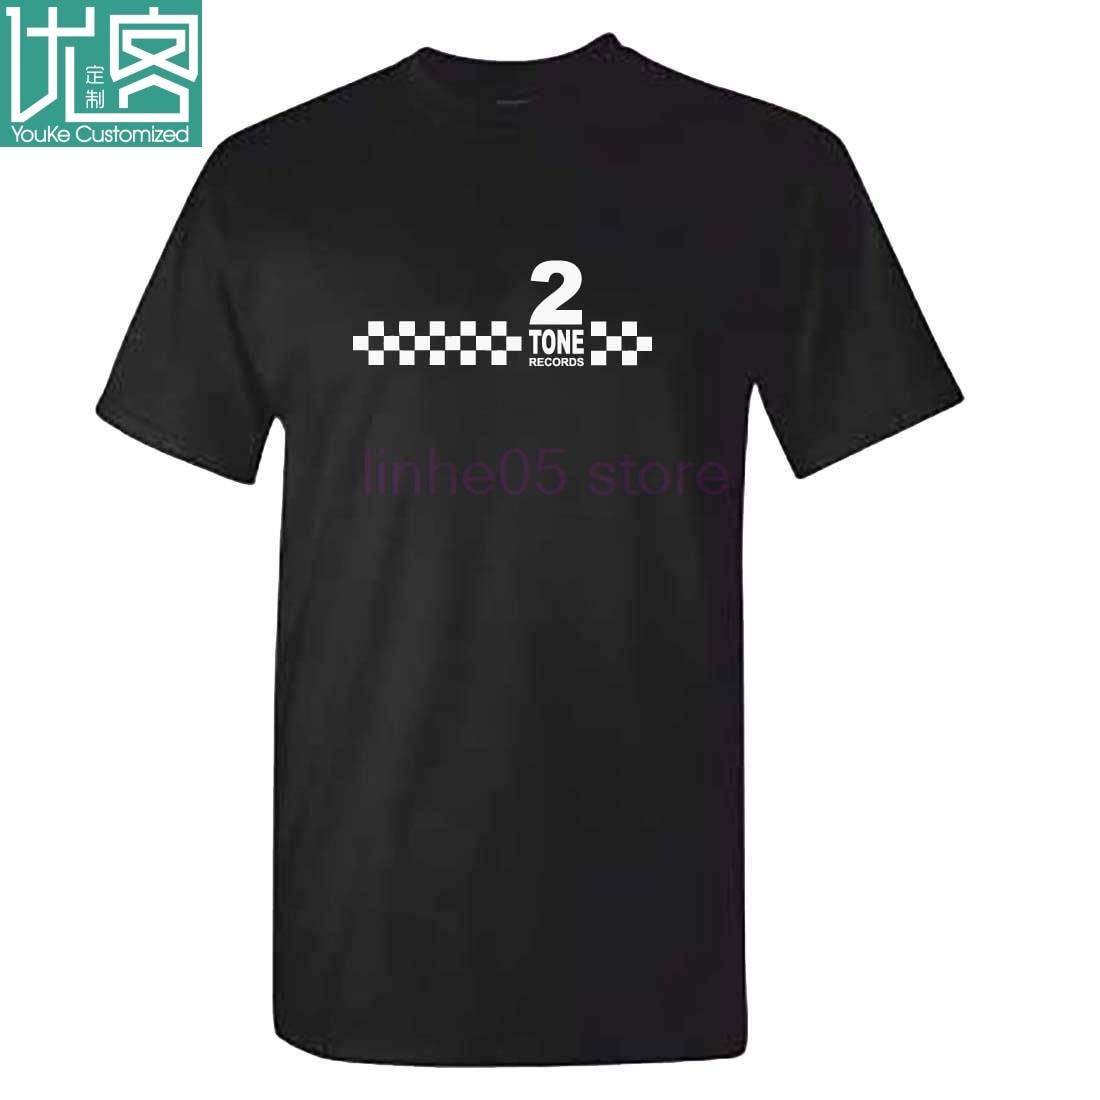 Camiseta para hombre con 2 tonos de música, ropa de Reggae